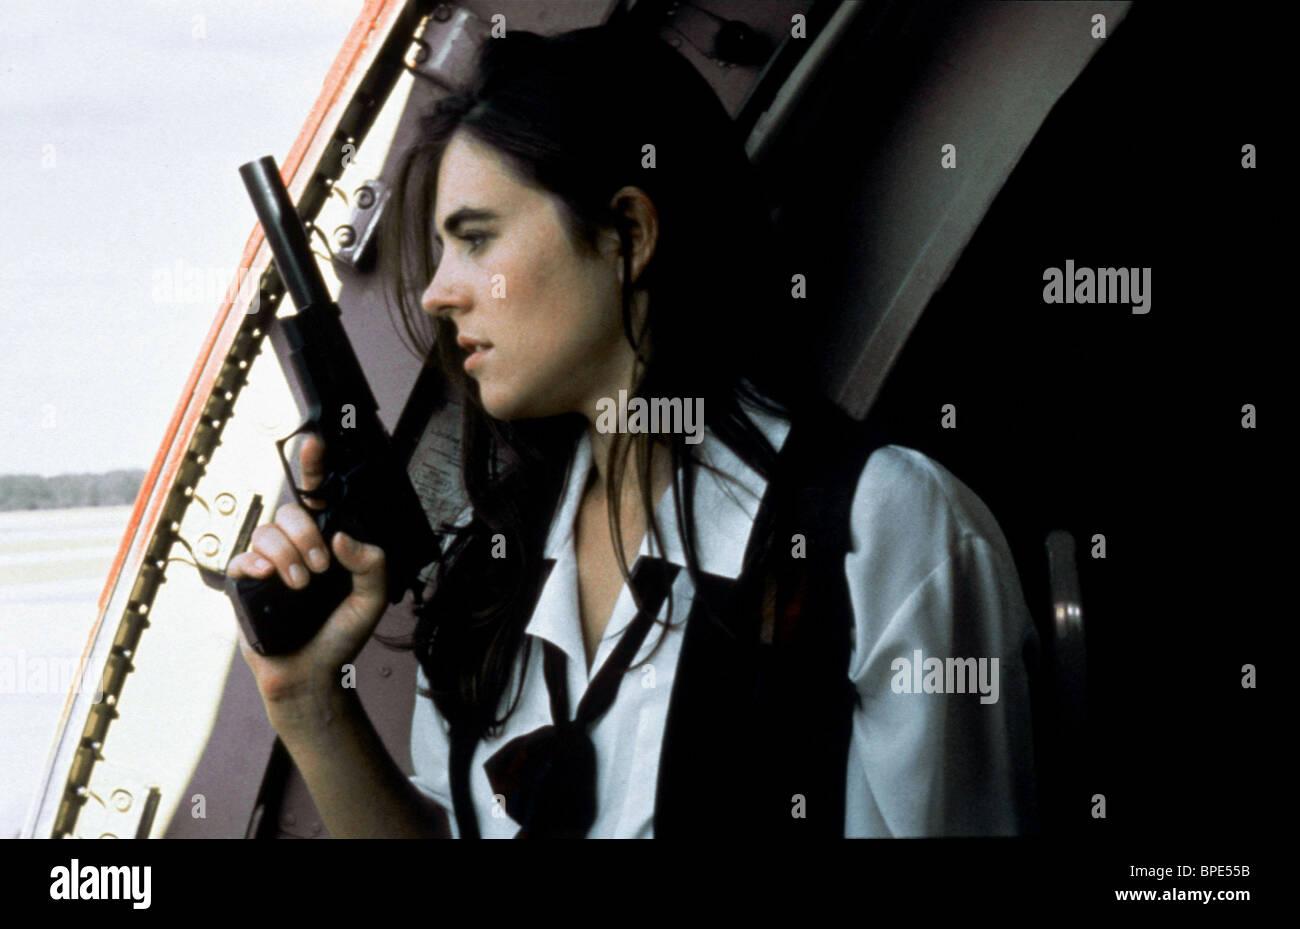 ELIZABETH HURLEY PASSENGER 57 (1992) - Stock Image